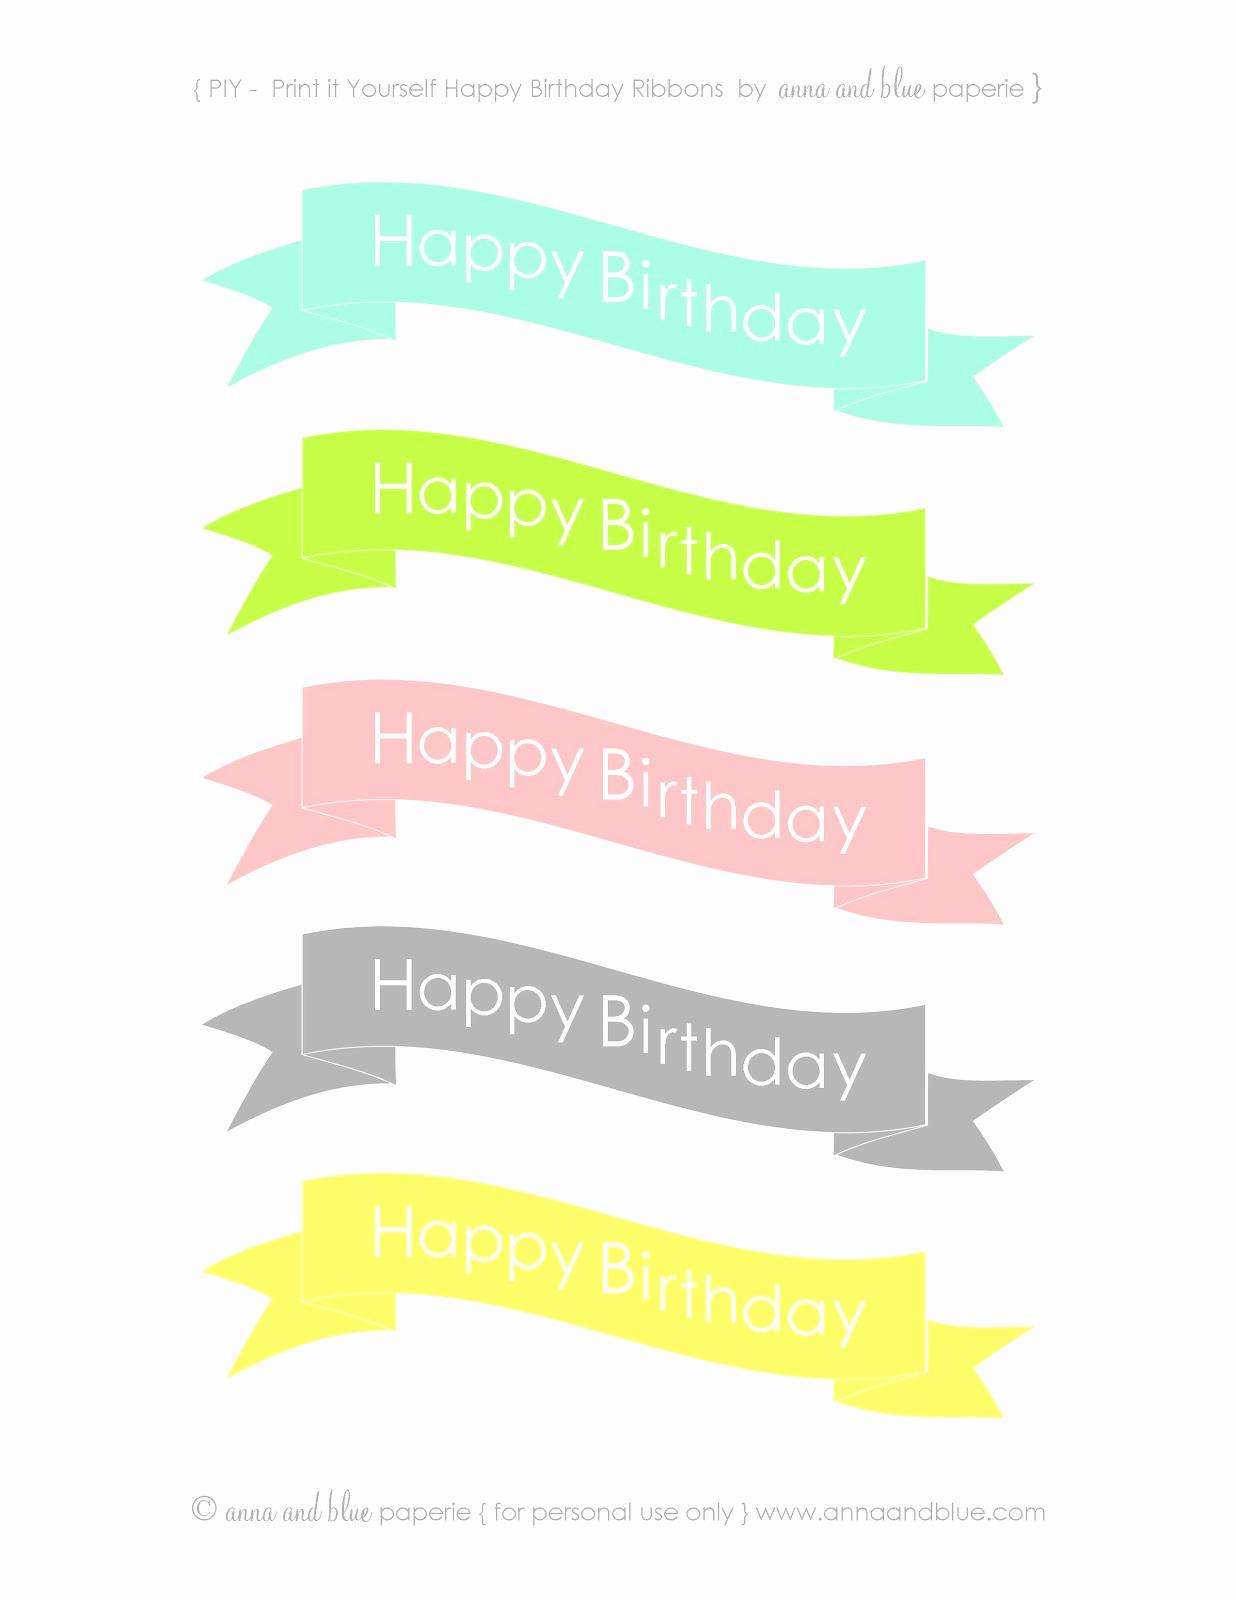 Printable Happy Birthday Banners Elegant Anna and Blue Paperie Free Printable Happy Birthday